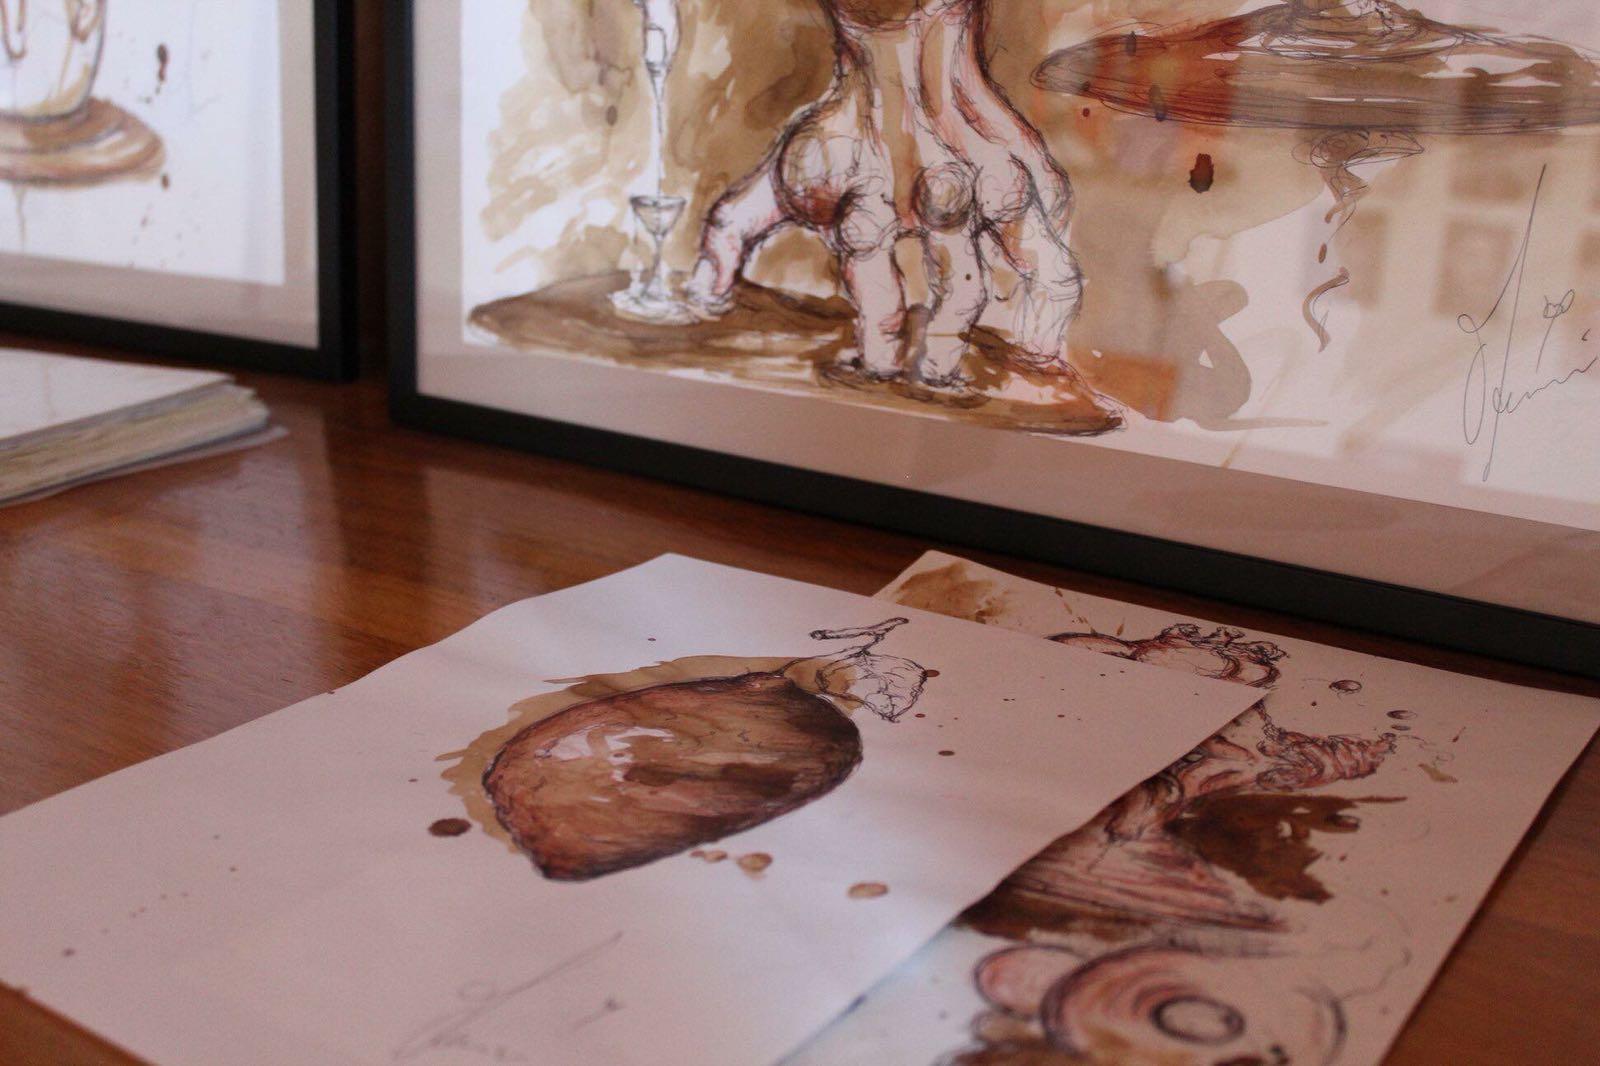 foto dell'opera dell'artista messinese Manuel Cavalli